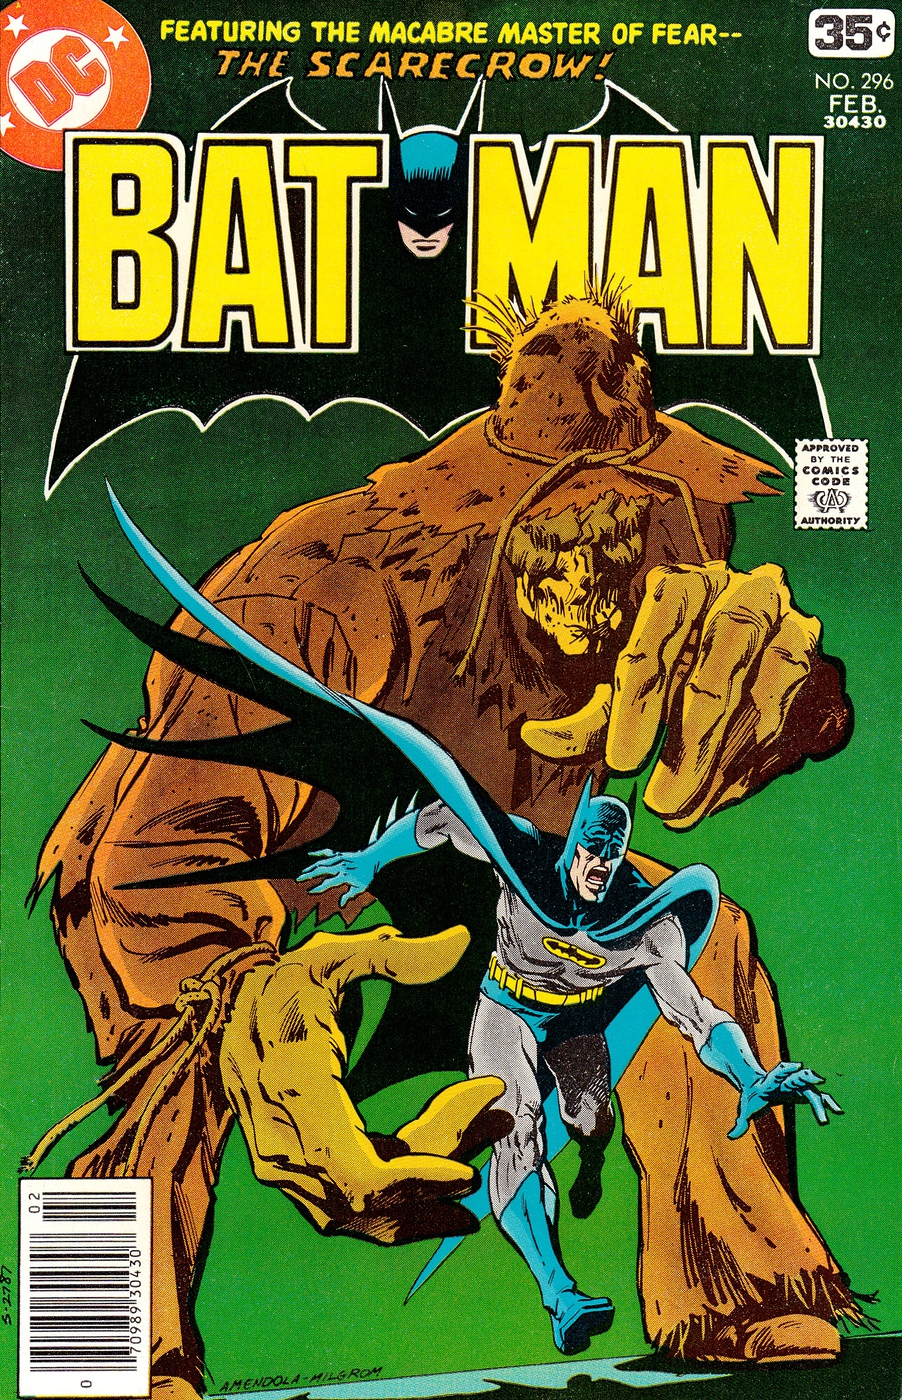 Batman #296